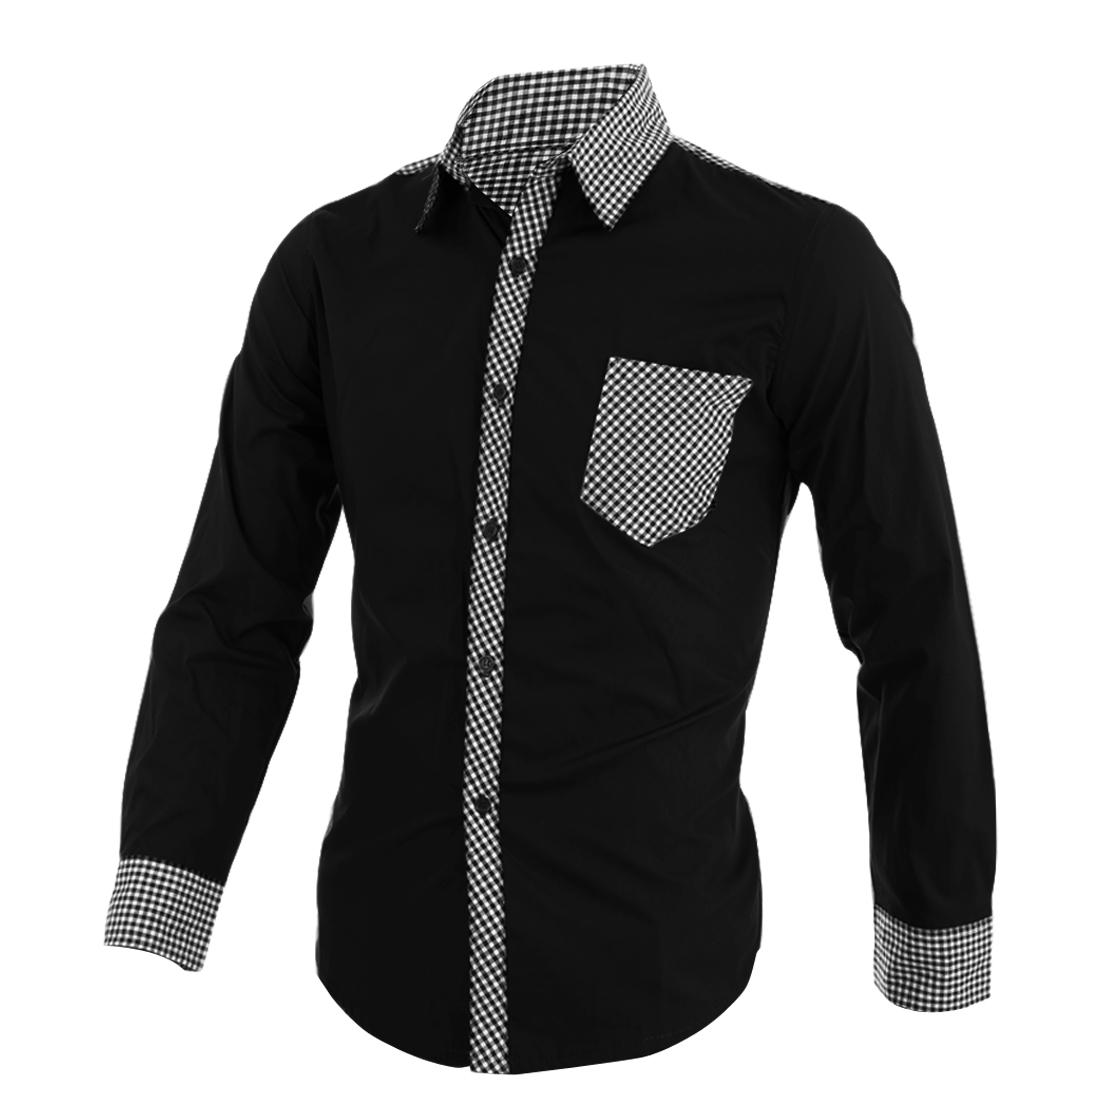 Men Chic Point Collar Long Sleeved Plaids Detail Black Casual Shirt M